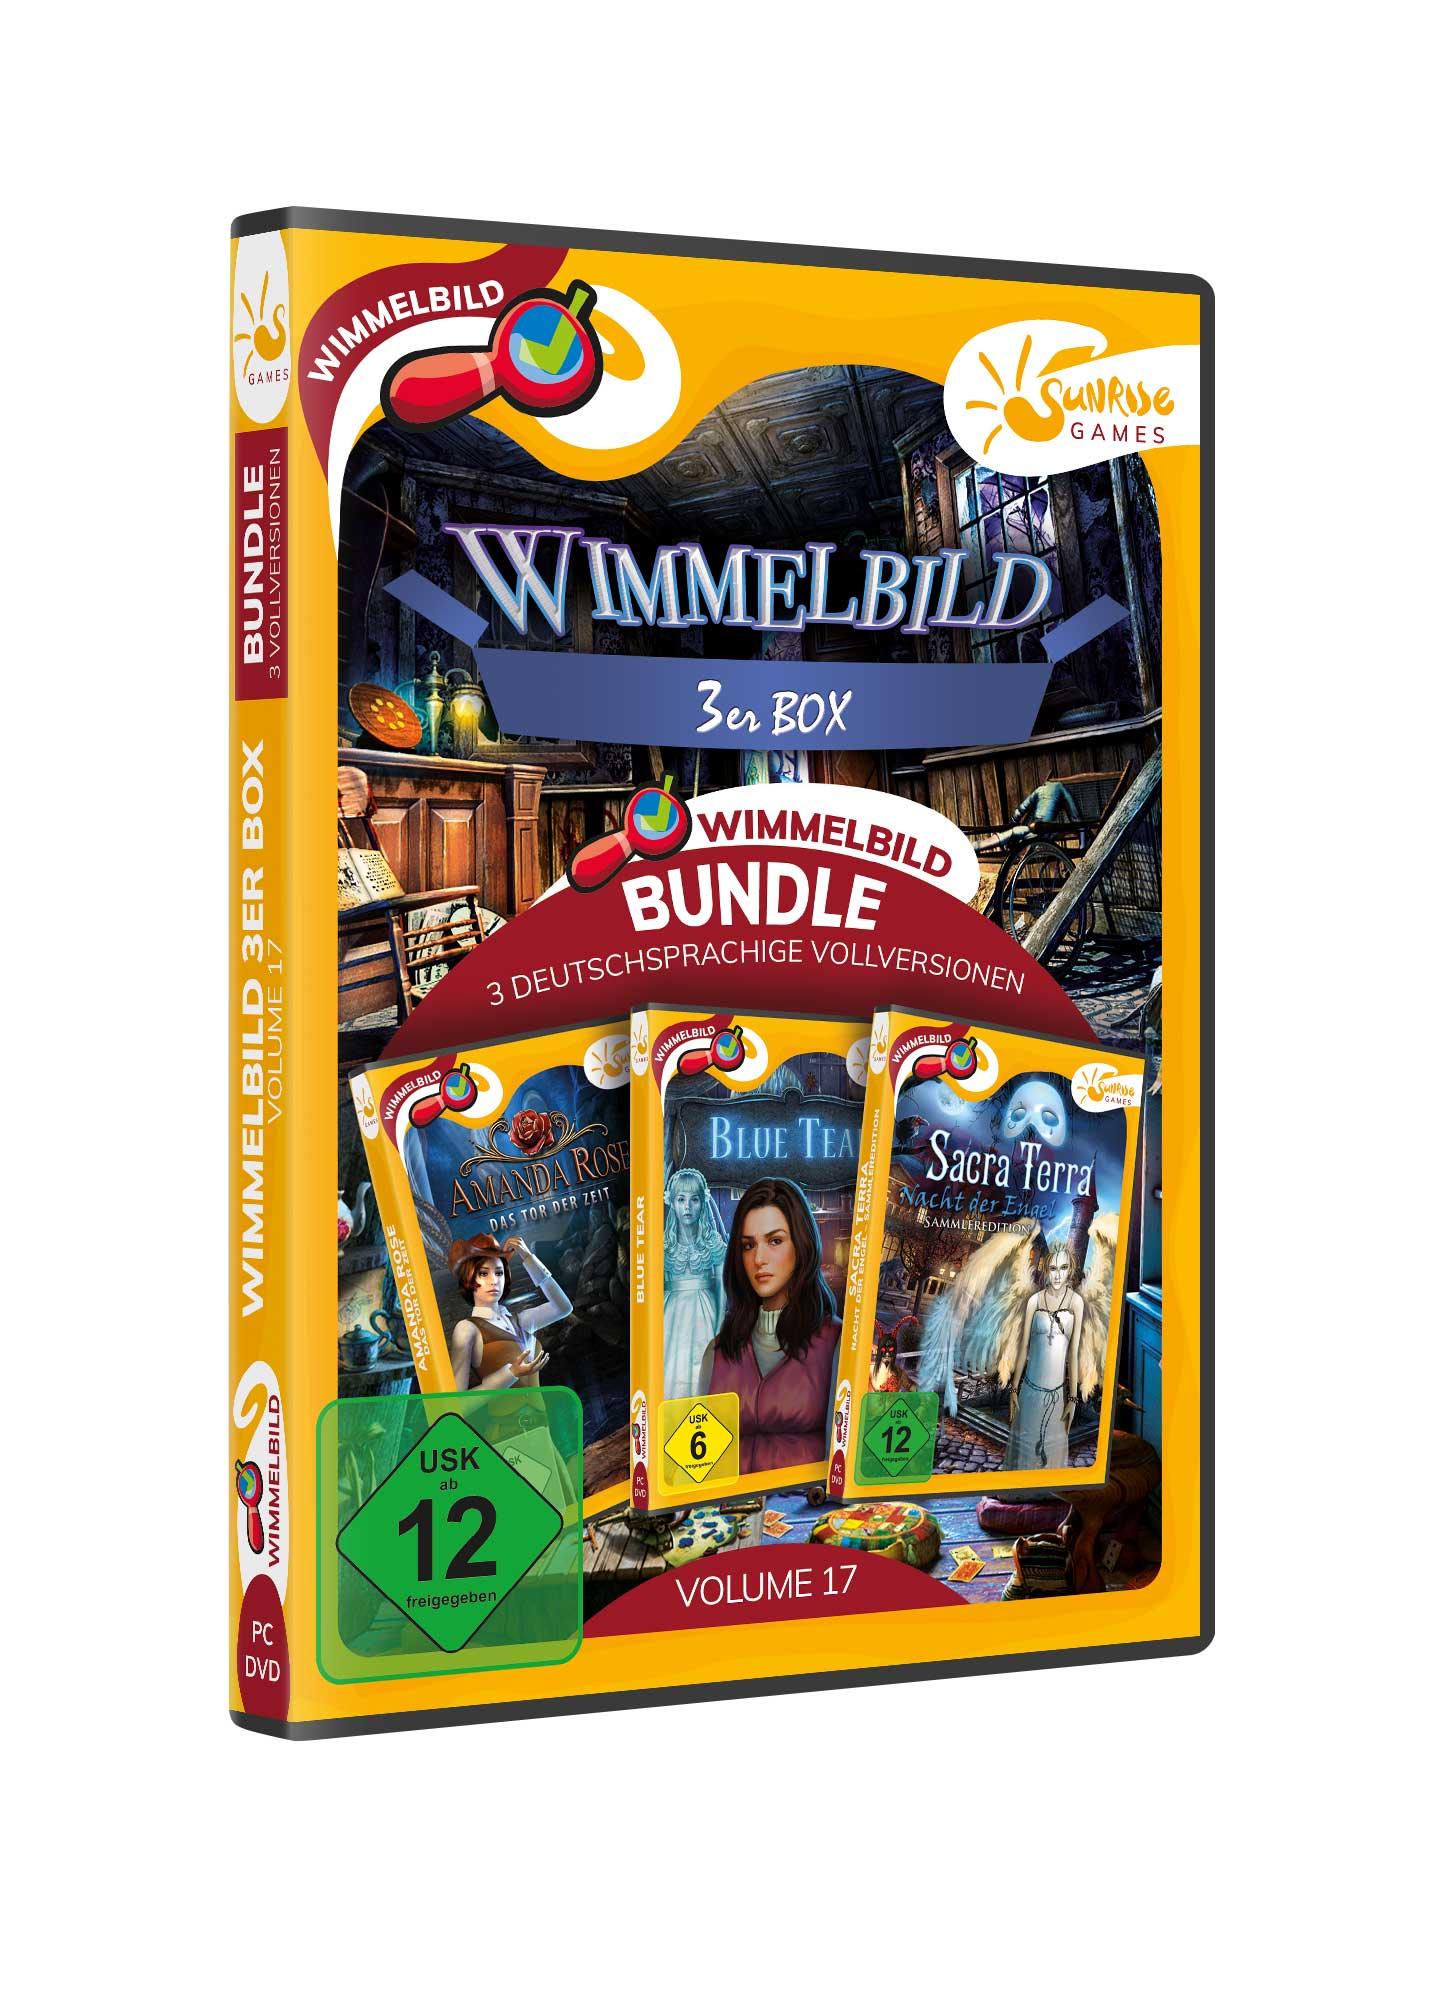 Wimmelbild Games